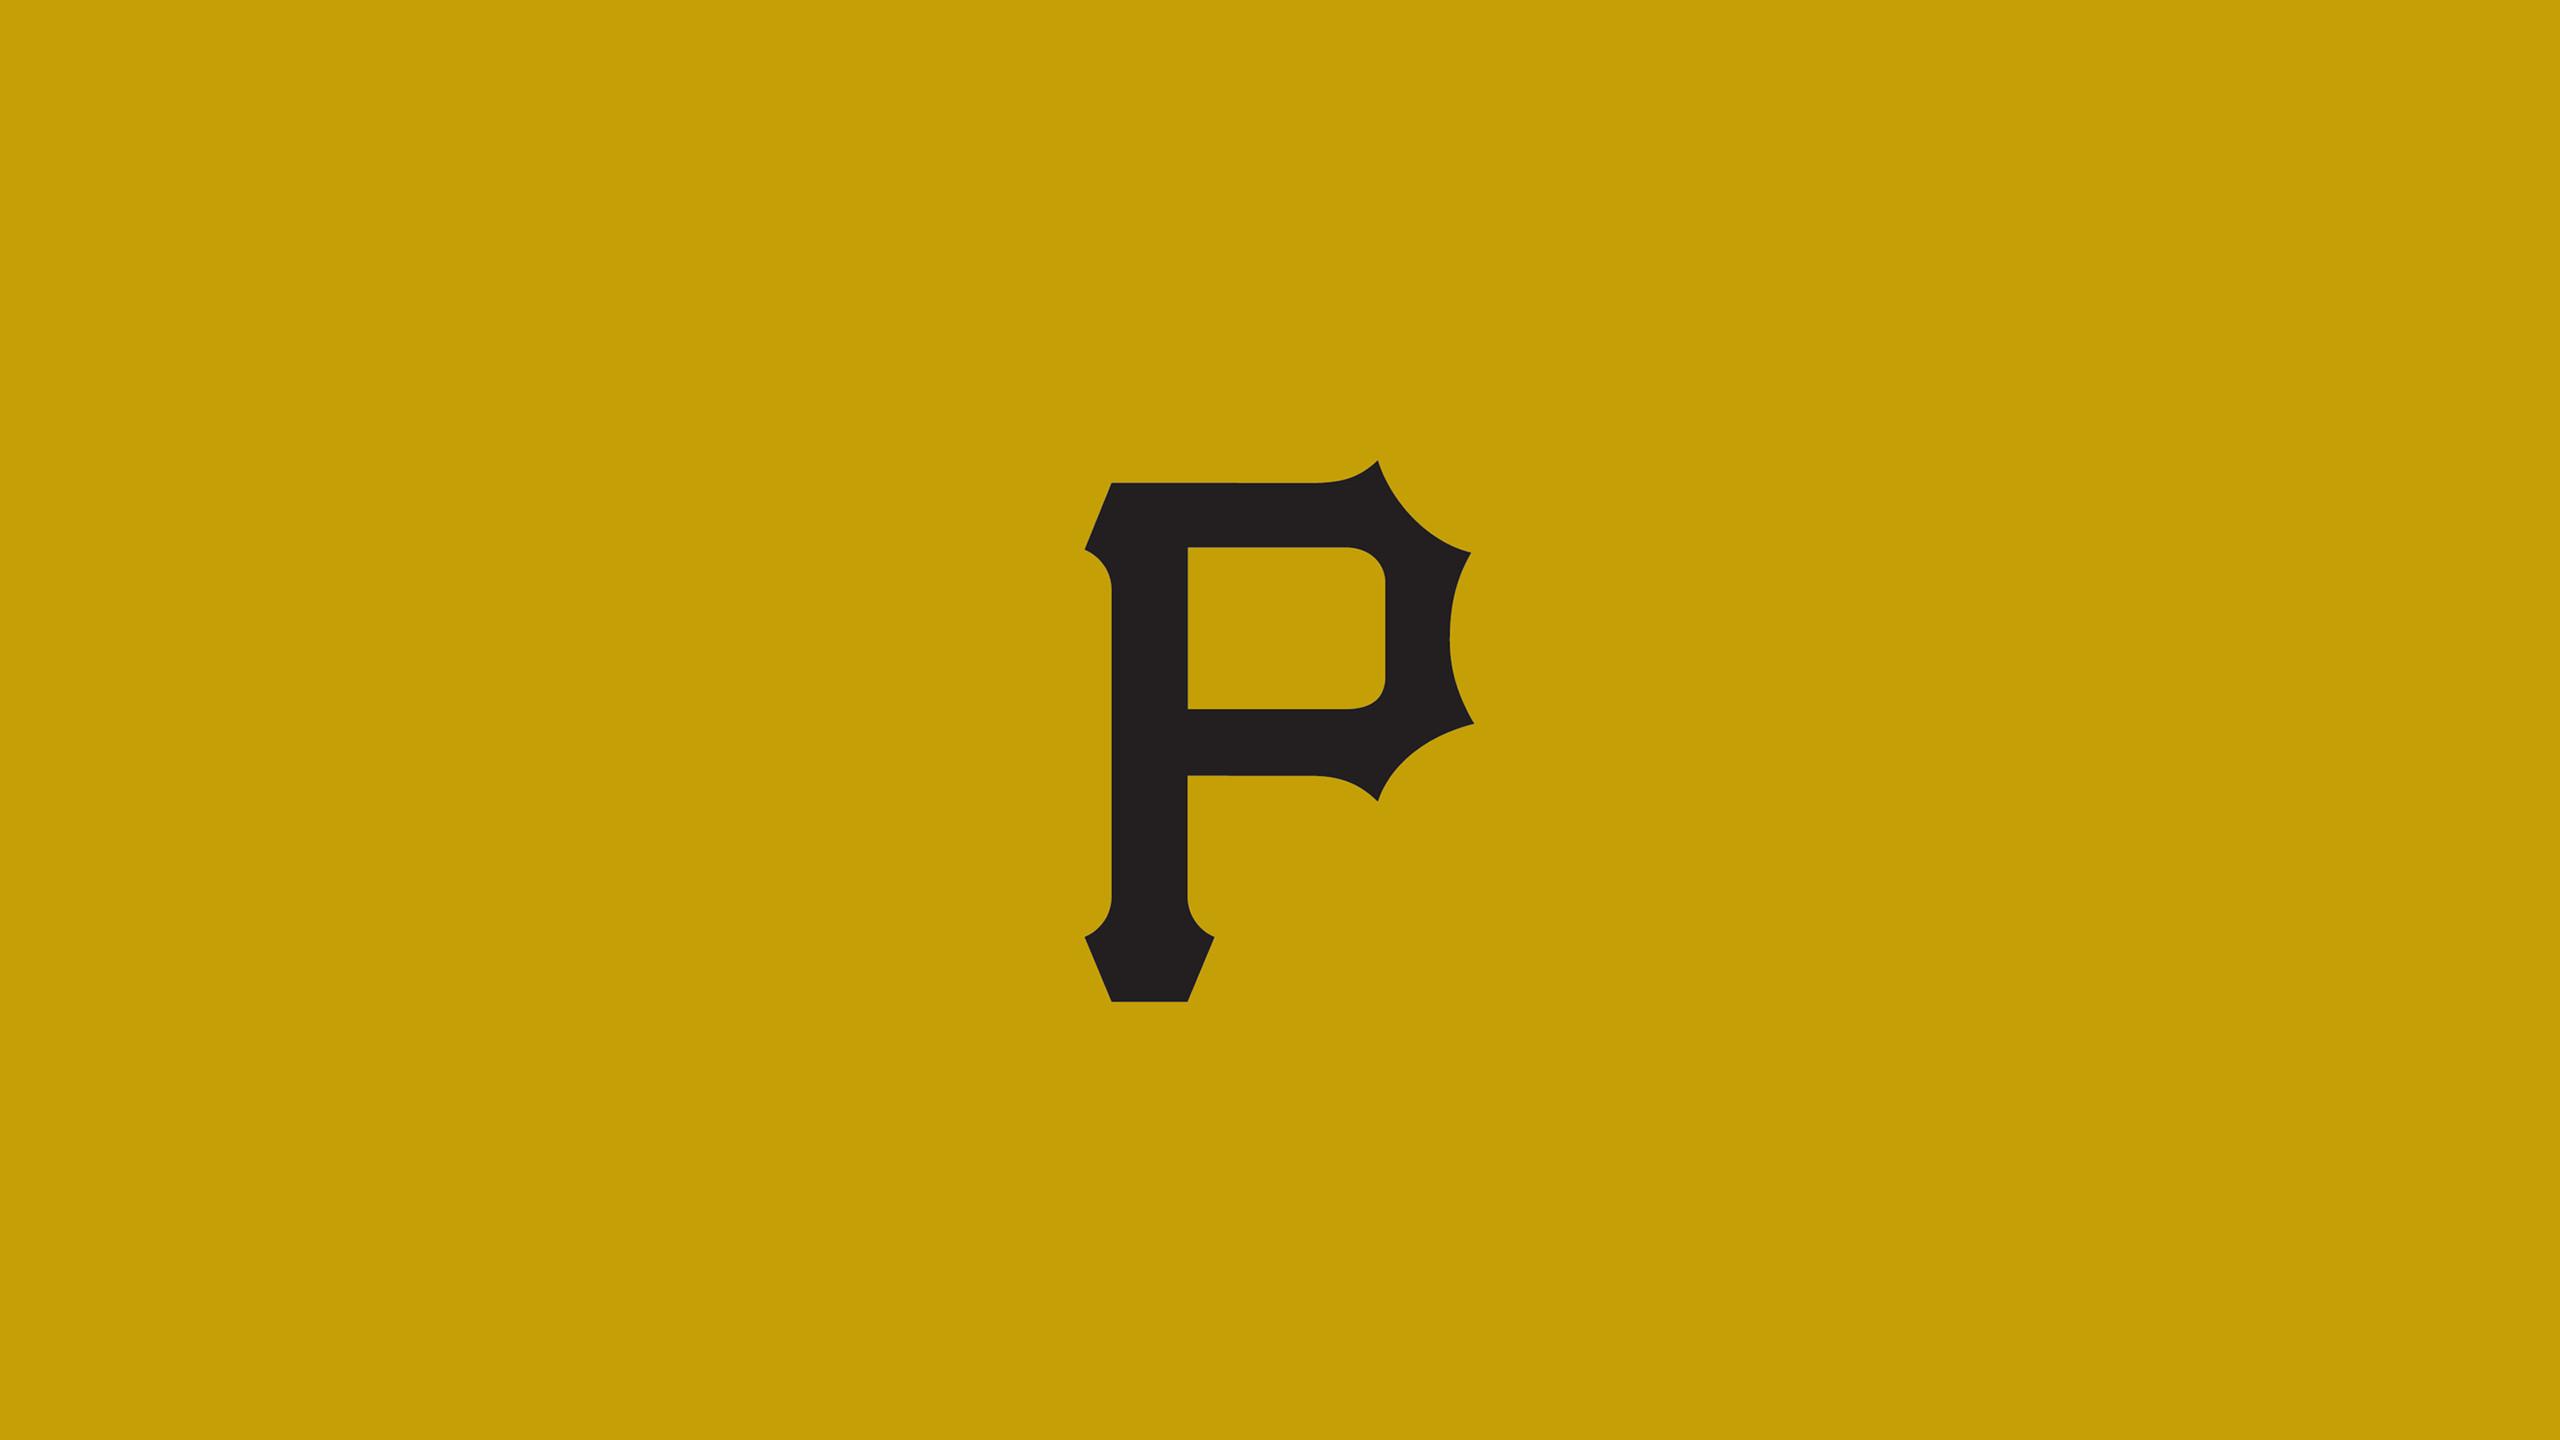 Free Pittsburgh Pirates Wallpaper, Fine HDQ Pittsburgh Pirates